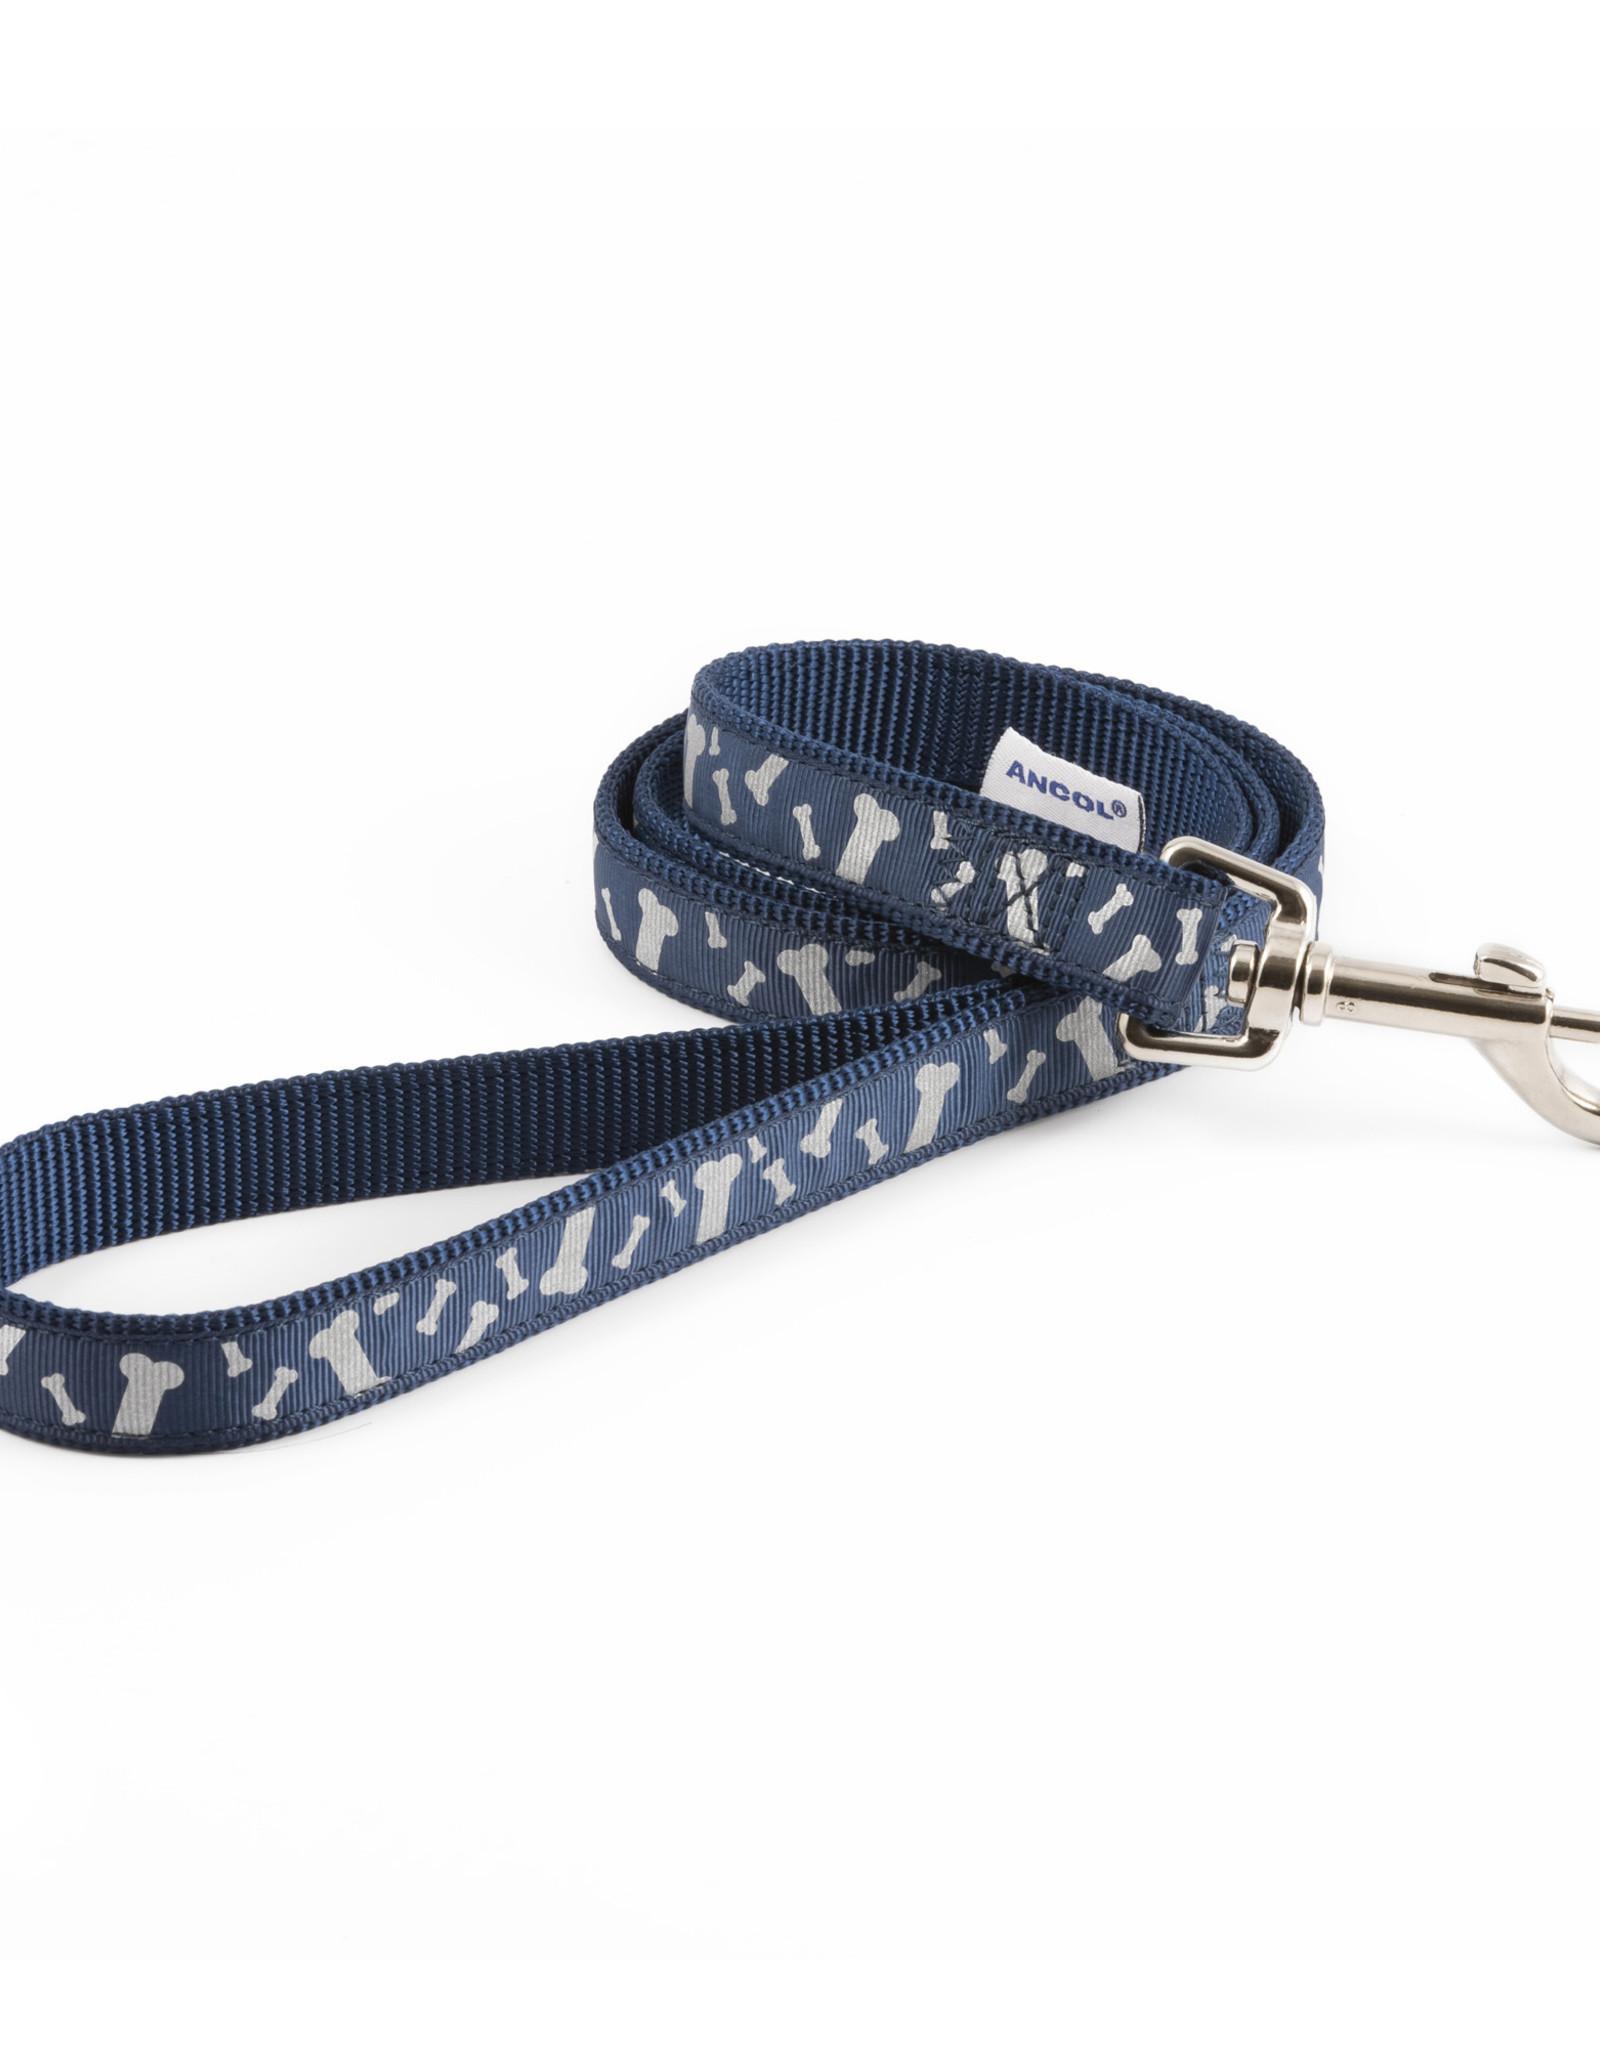 Ancol Nylon Blue Bone Reflective Dog Lead 19mm x 1m